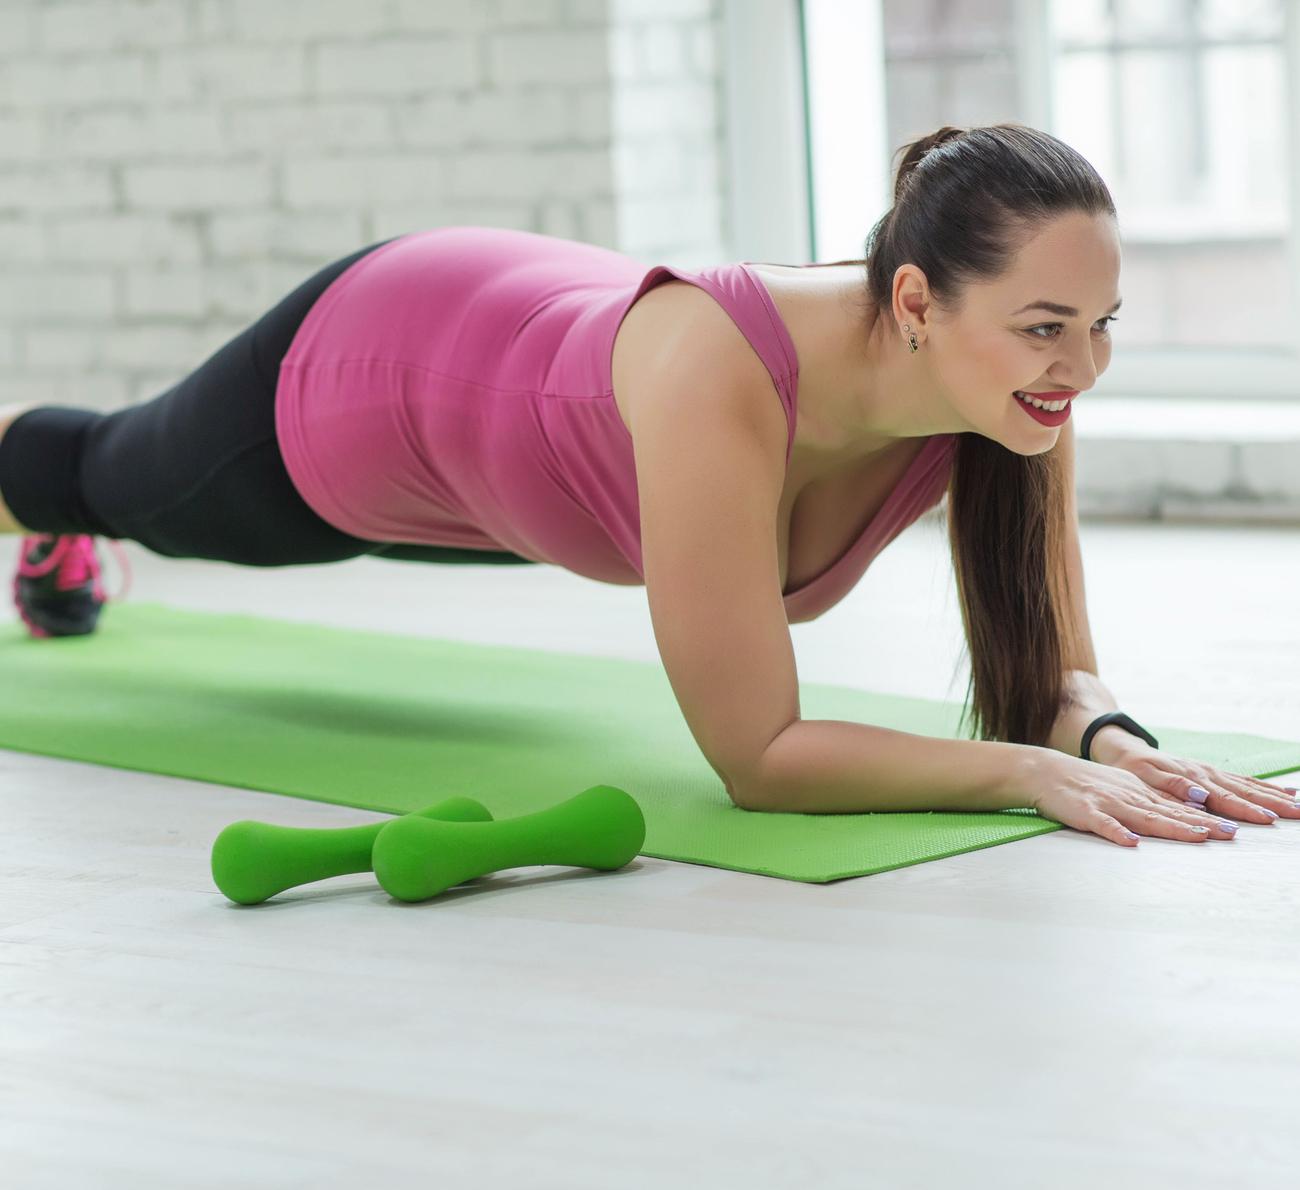 atividade física ajuda engravidar